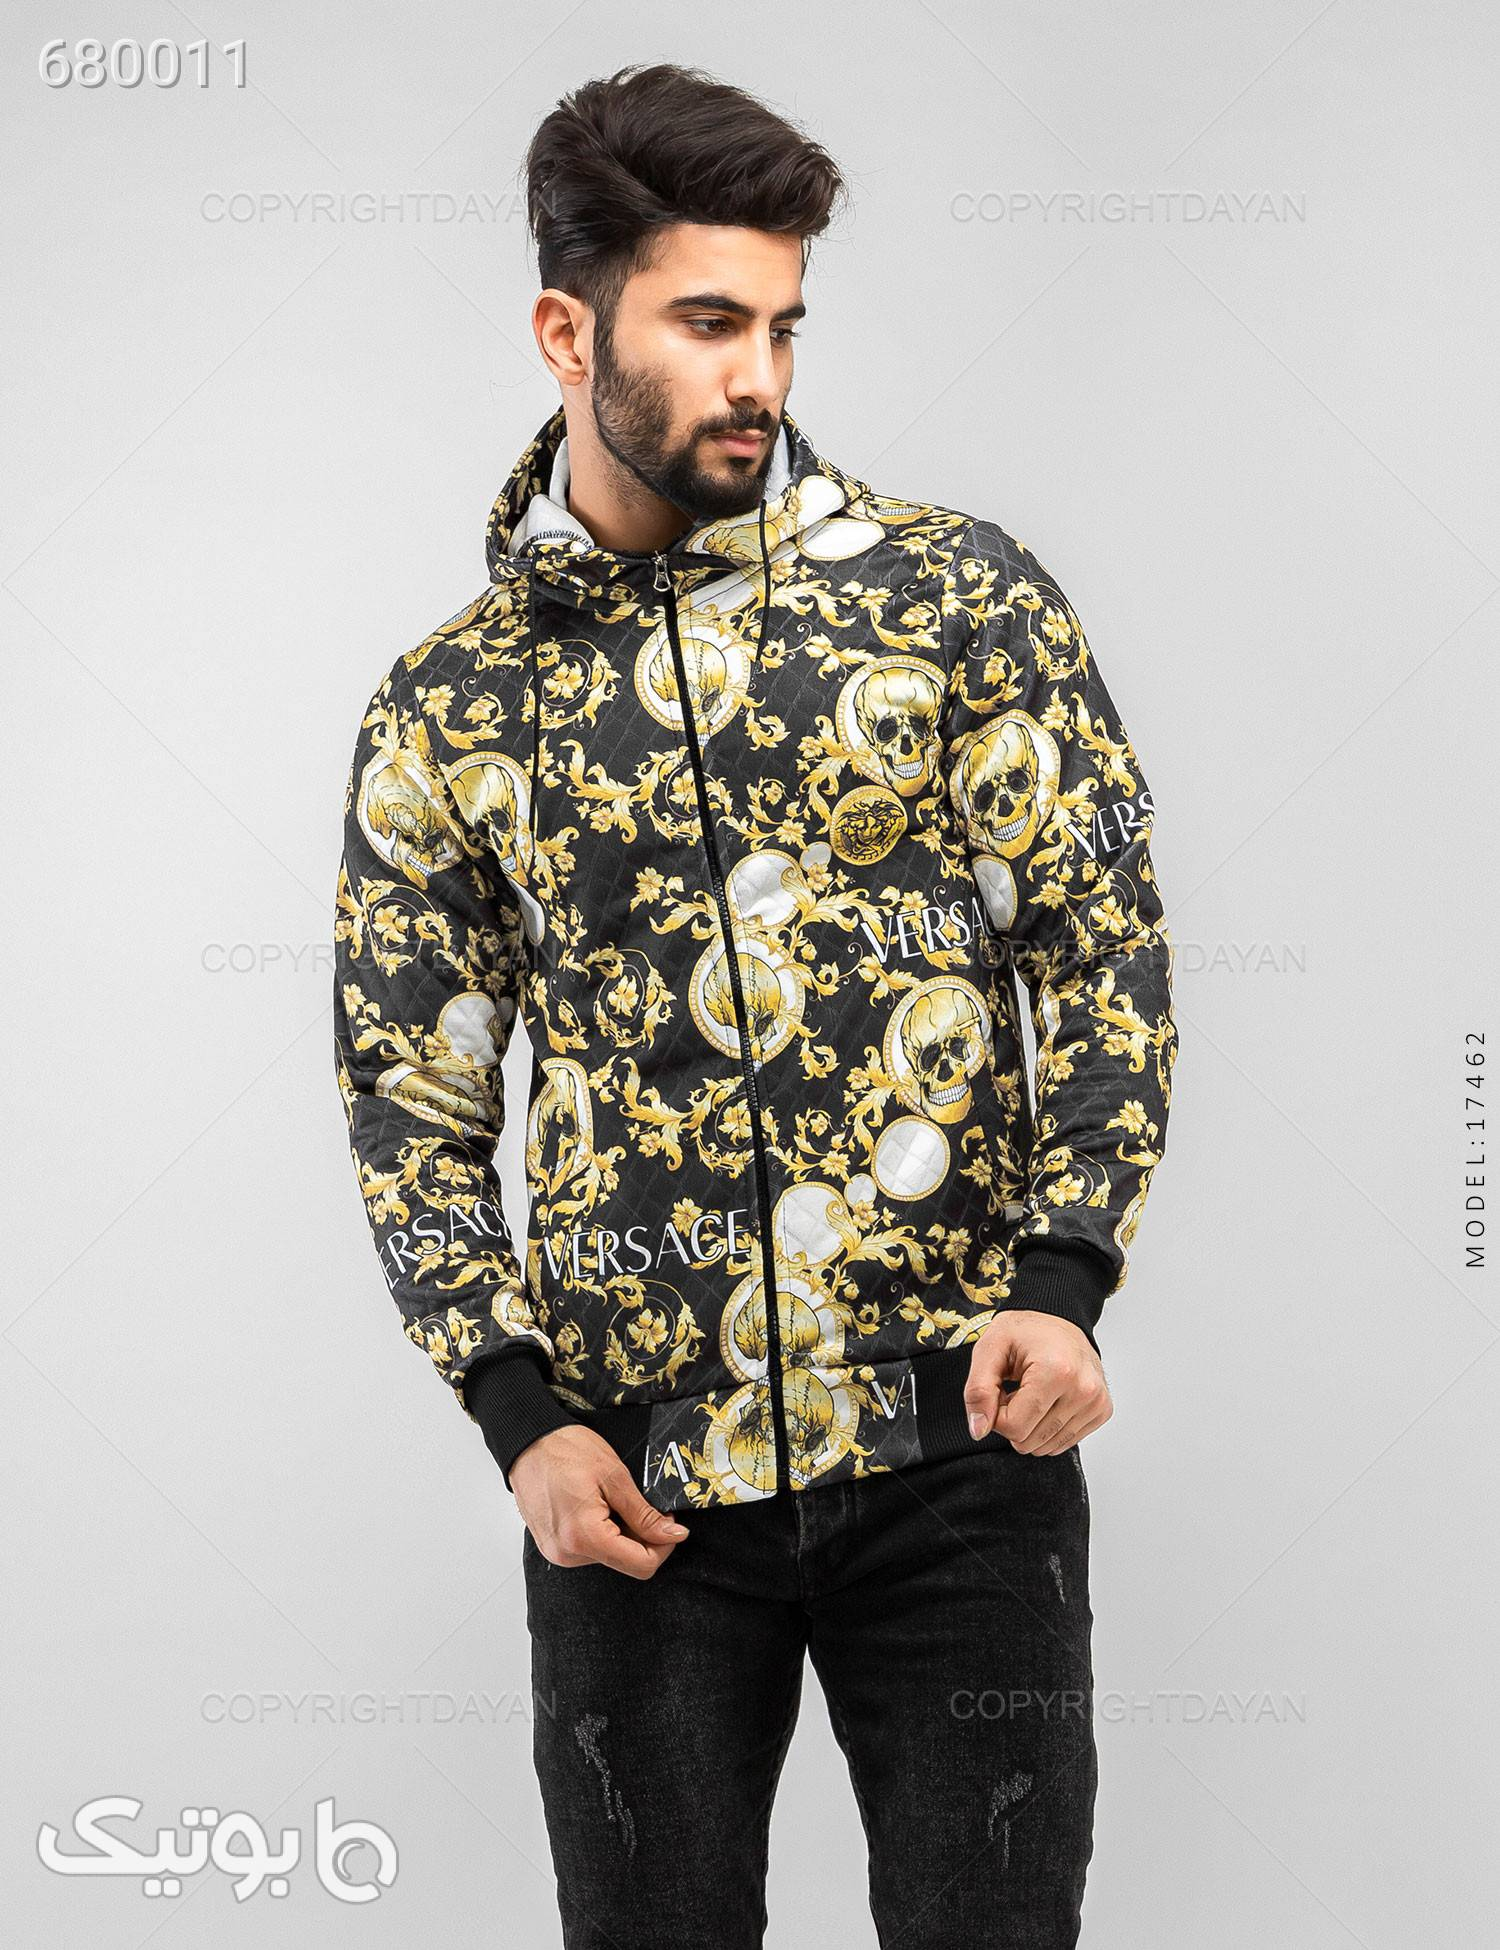 سویشرت مردانه Versace مدل 17462 زرد سوئیشرت و هودی مردانه